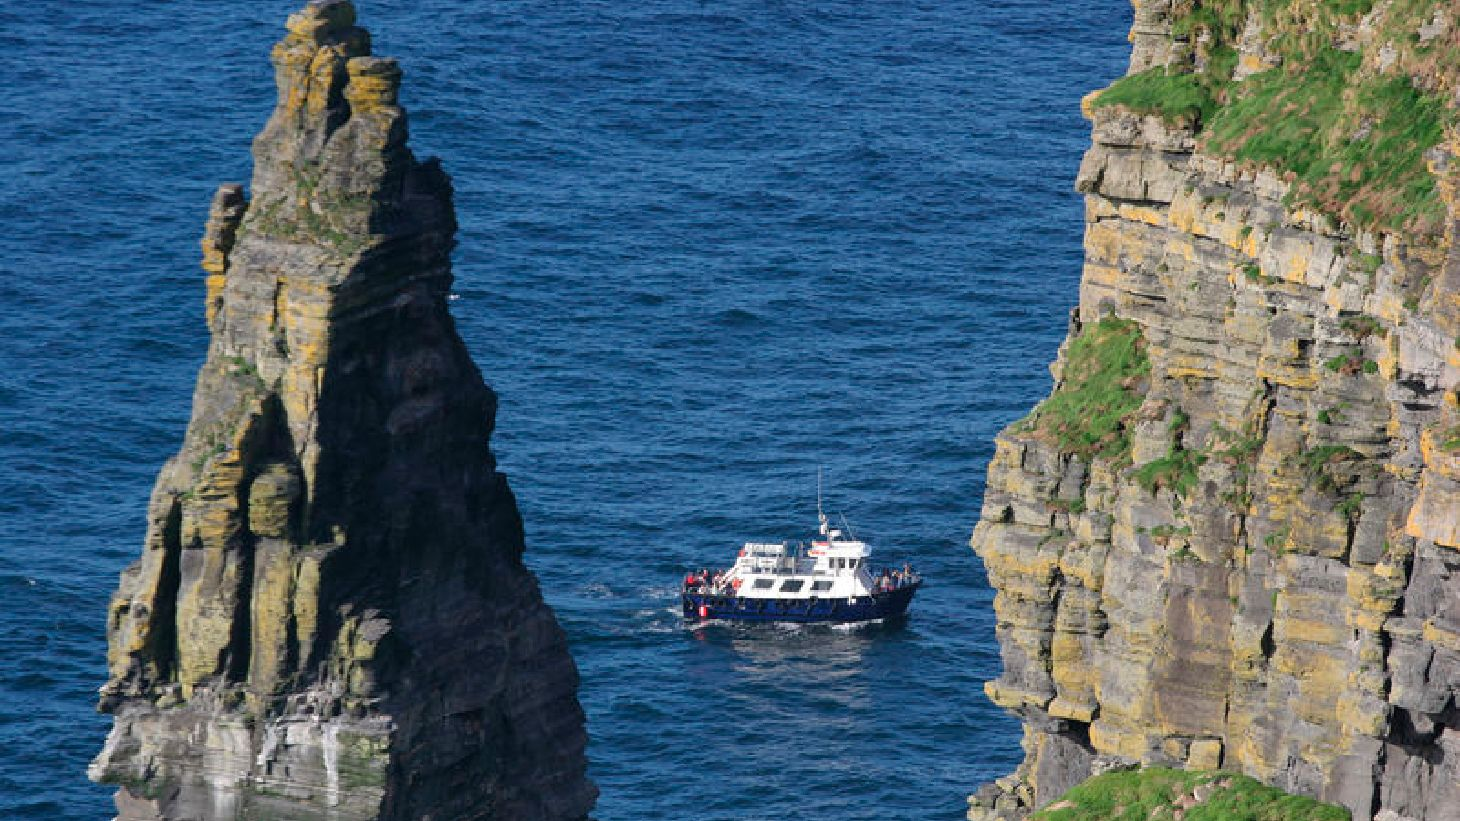 Journey along the 6km of coastline from Doolin Pieron the Doolin Ferry.